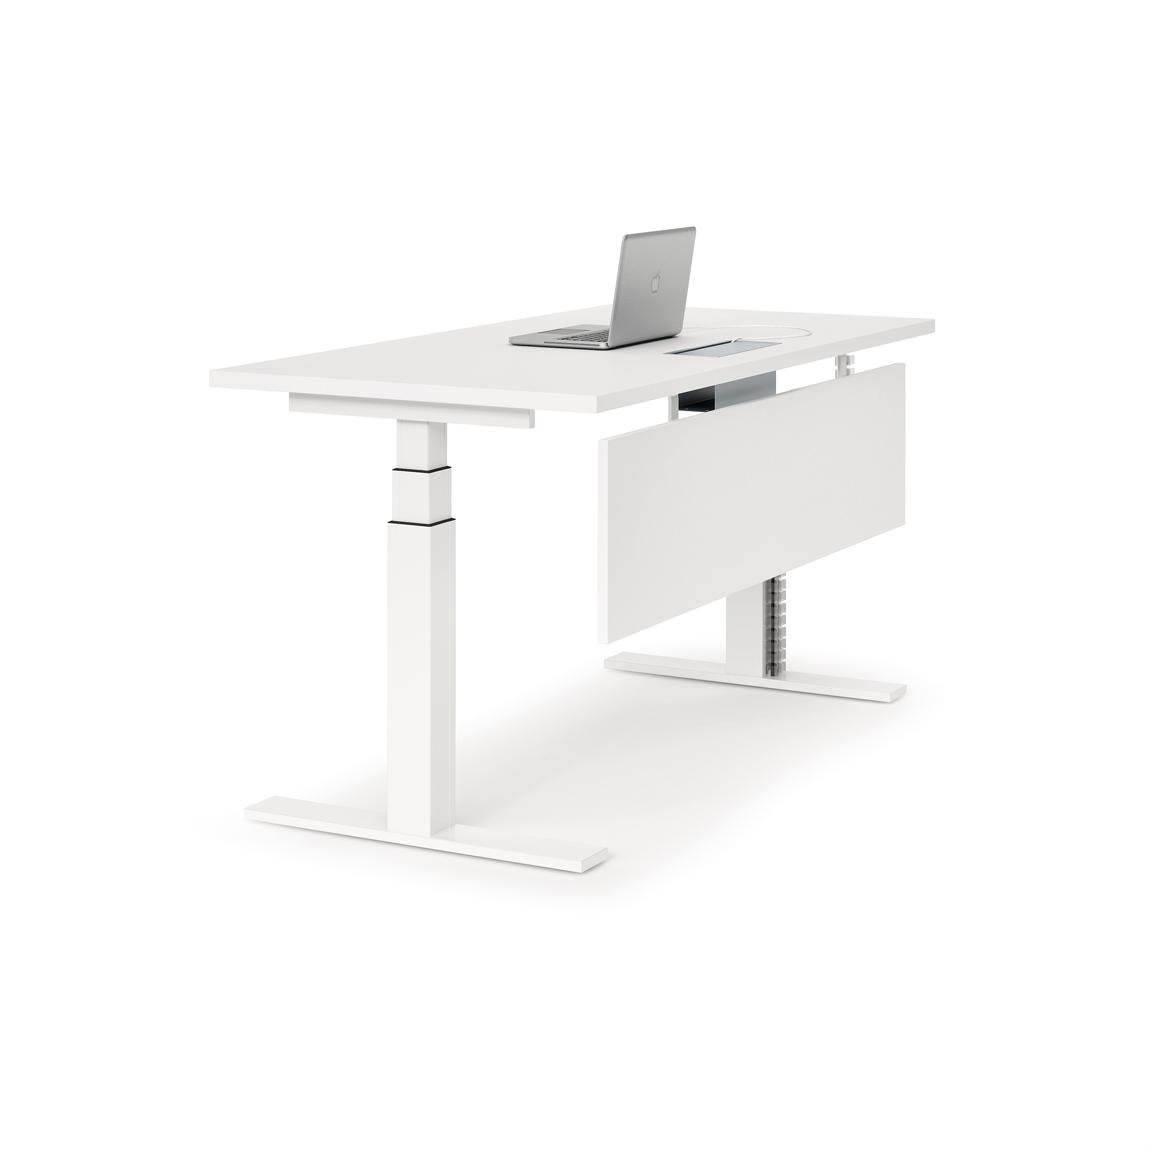 Zit Sta Stoel Ikea.Stappenplan Storing Elektrisch Zit Sta Bureau Project Meubilair